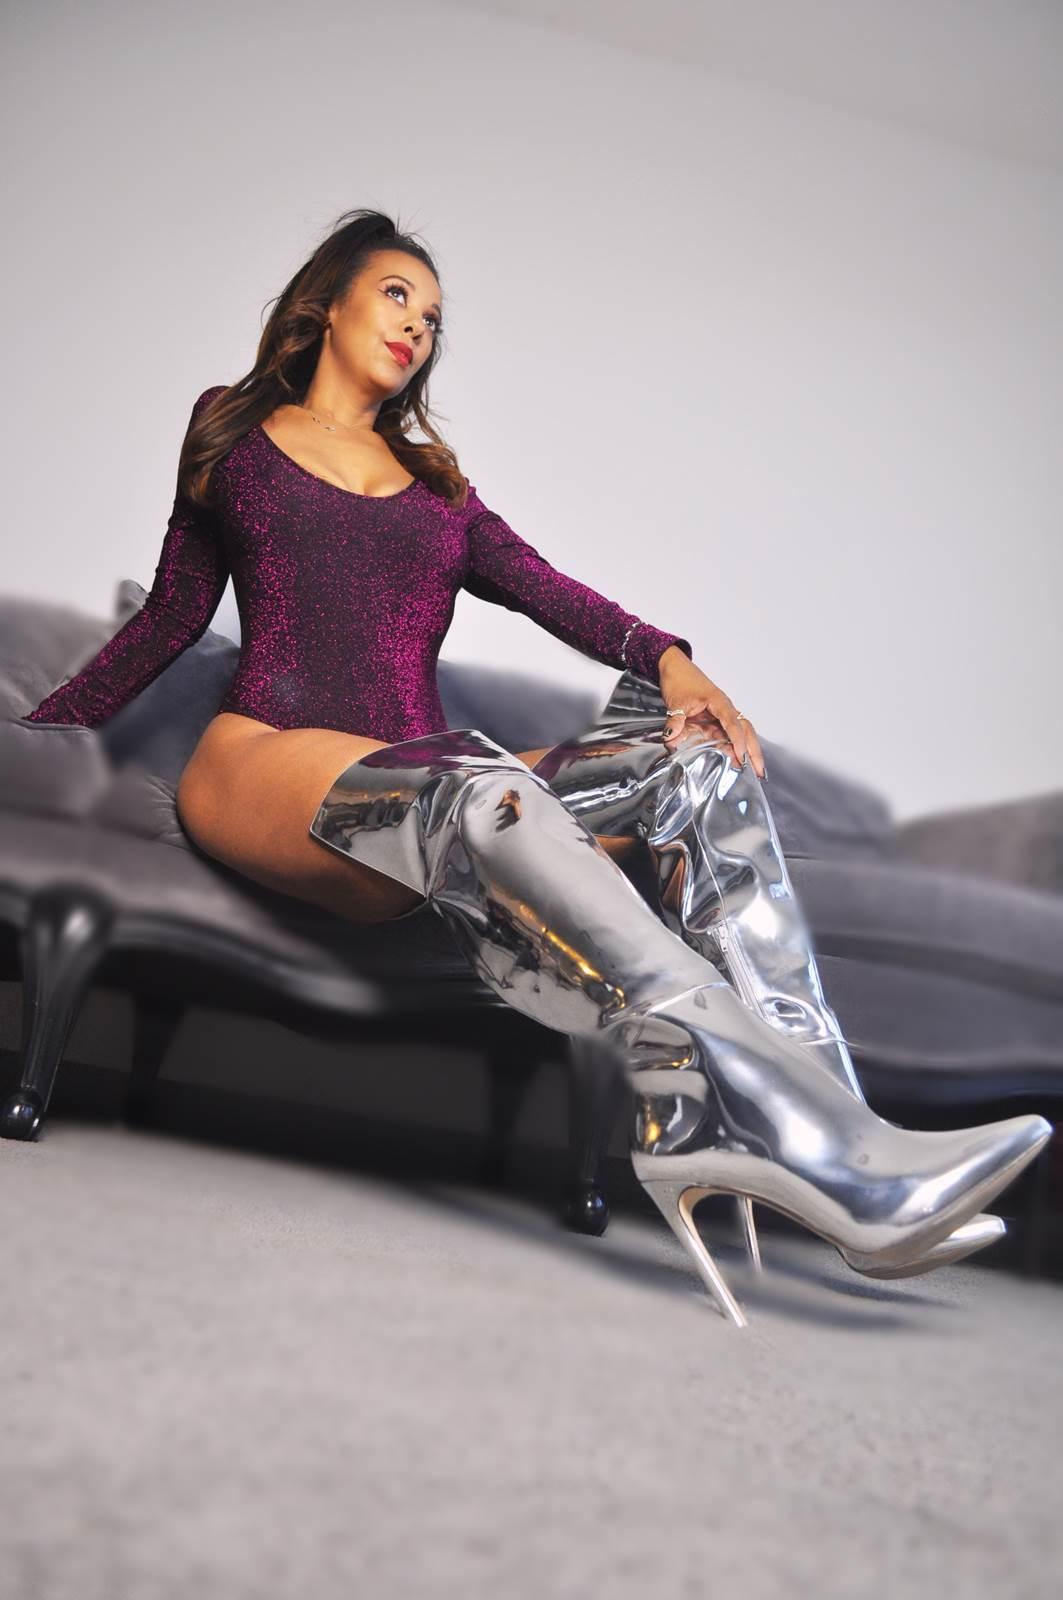 boots worship domination goddess